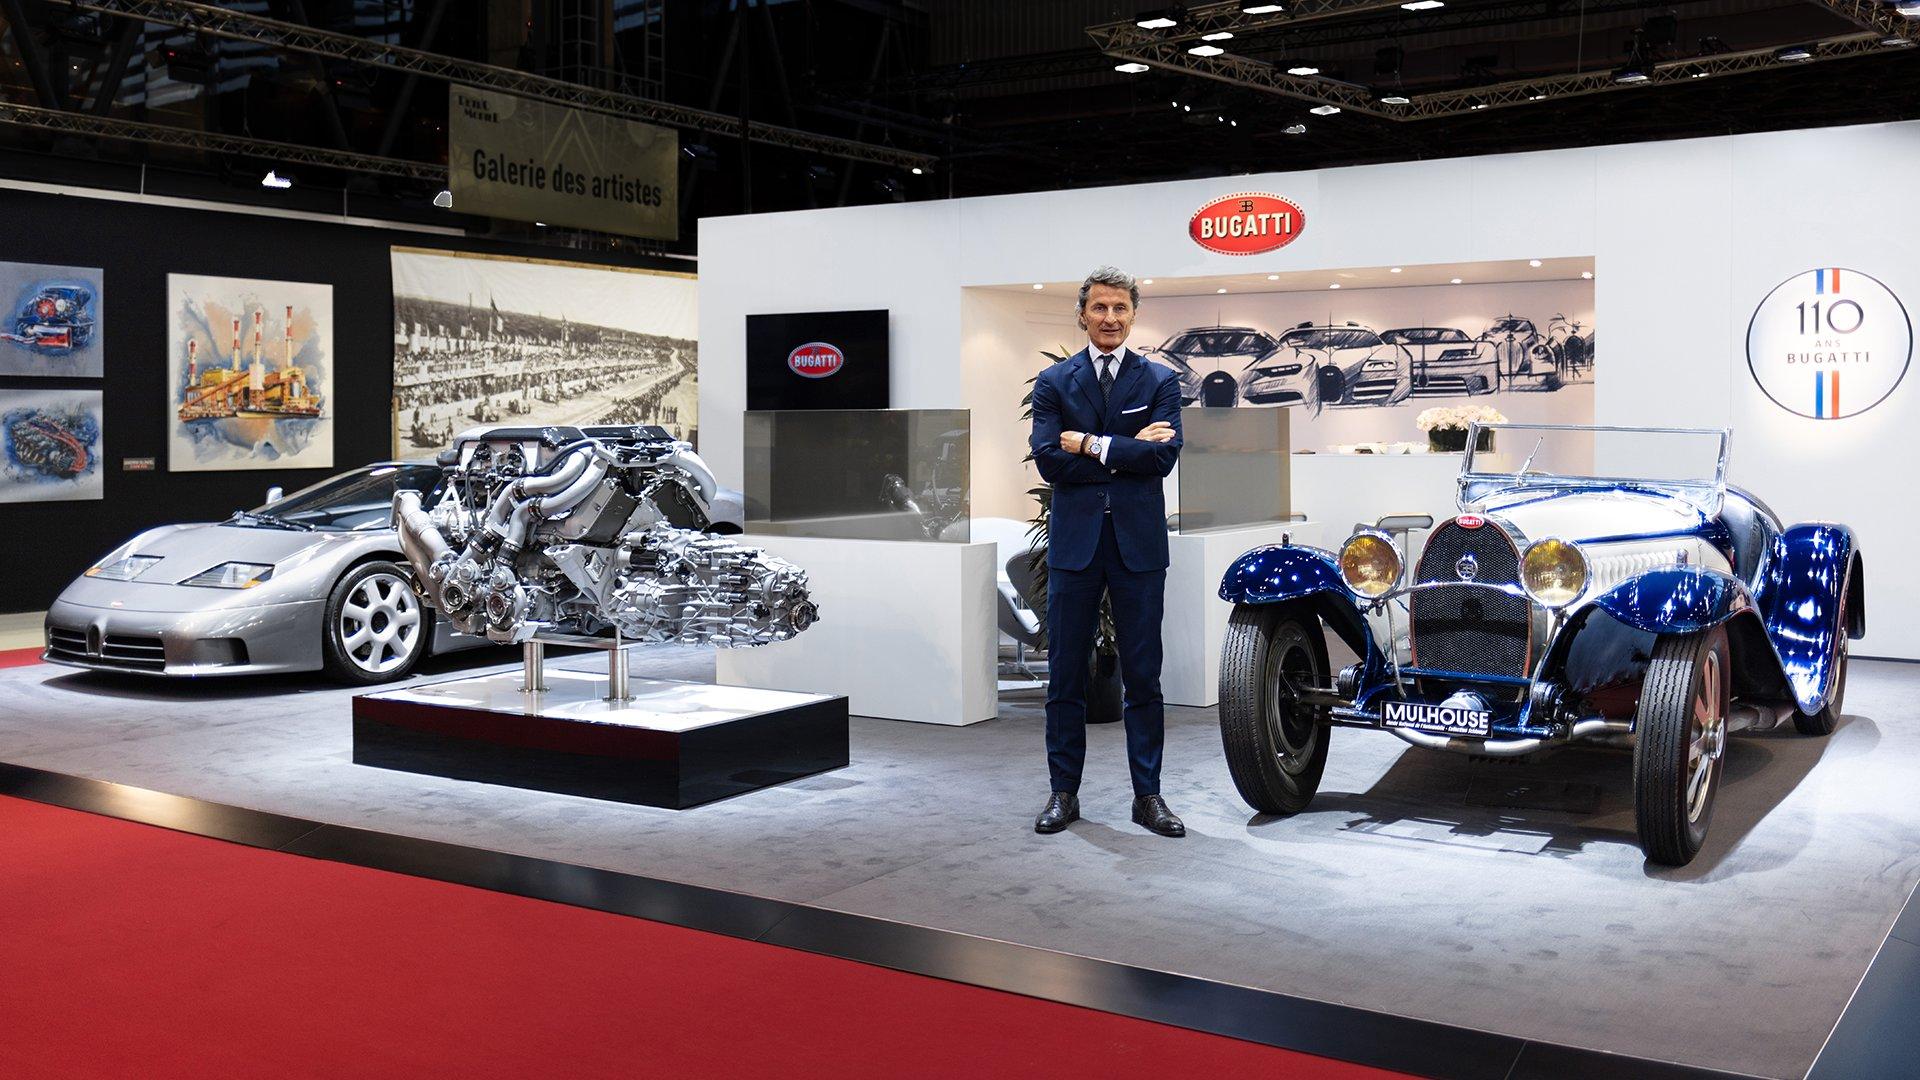 stephan_winkelmann_president_of_bugatti_at_the_retromobile_show_2019.jpg